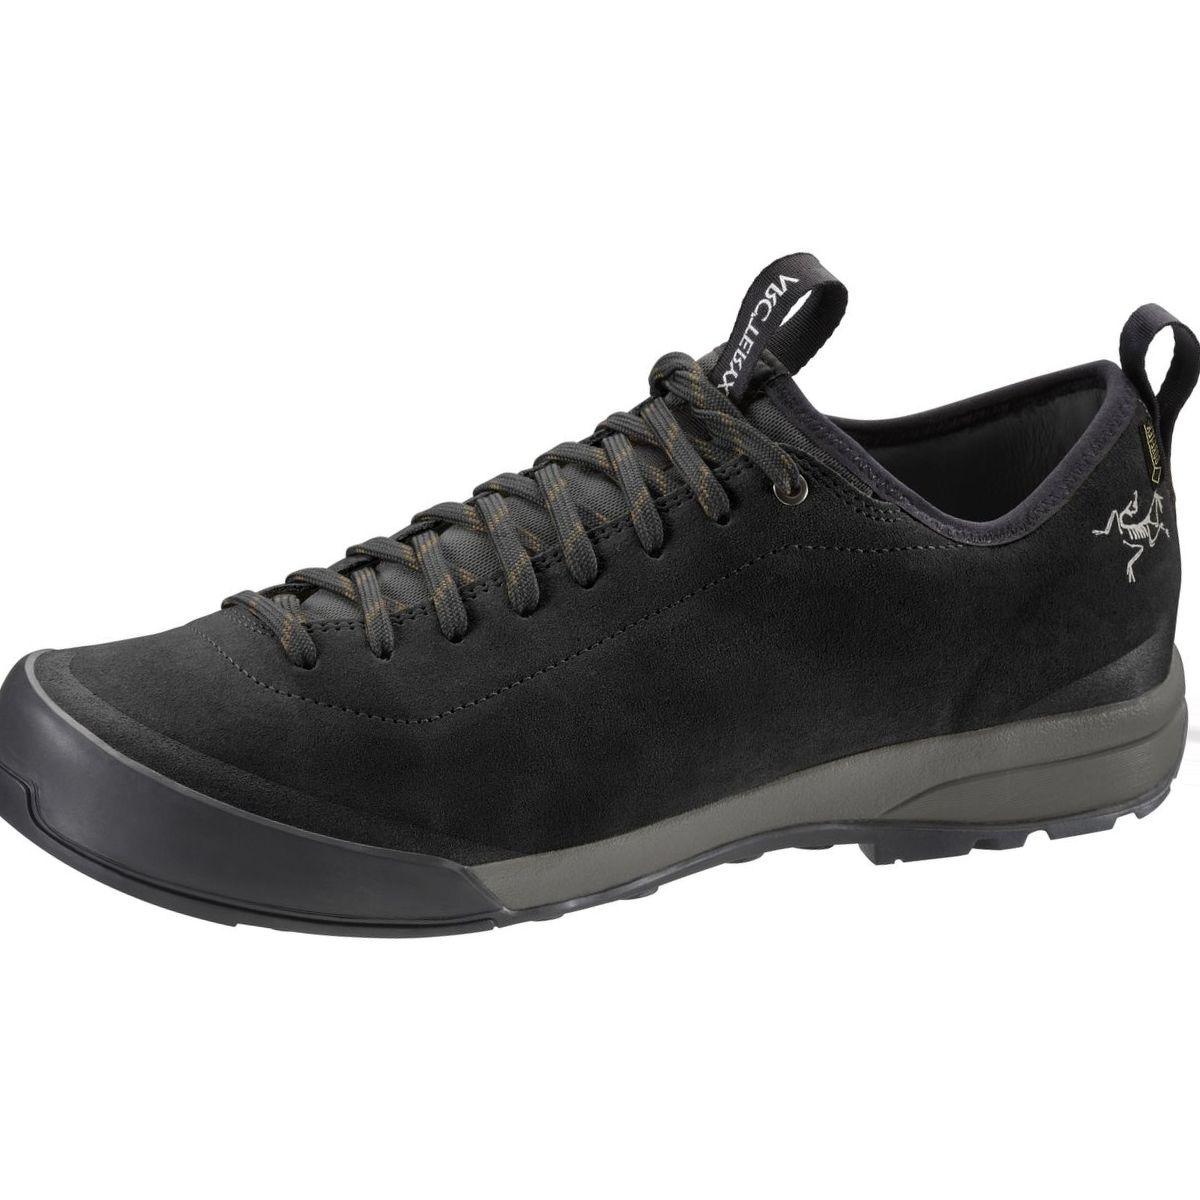 Arc'teryx Acrux SL Leather GTX Approach Shoe - Men's